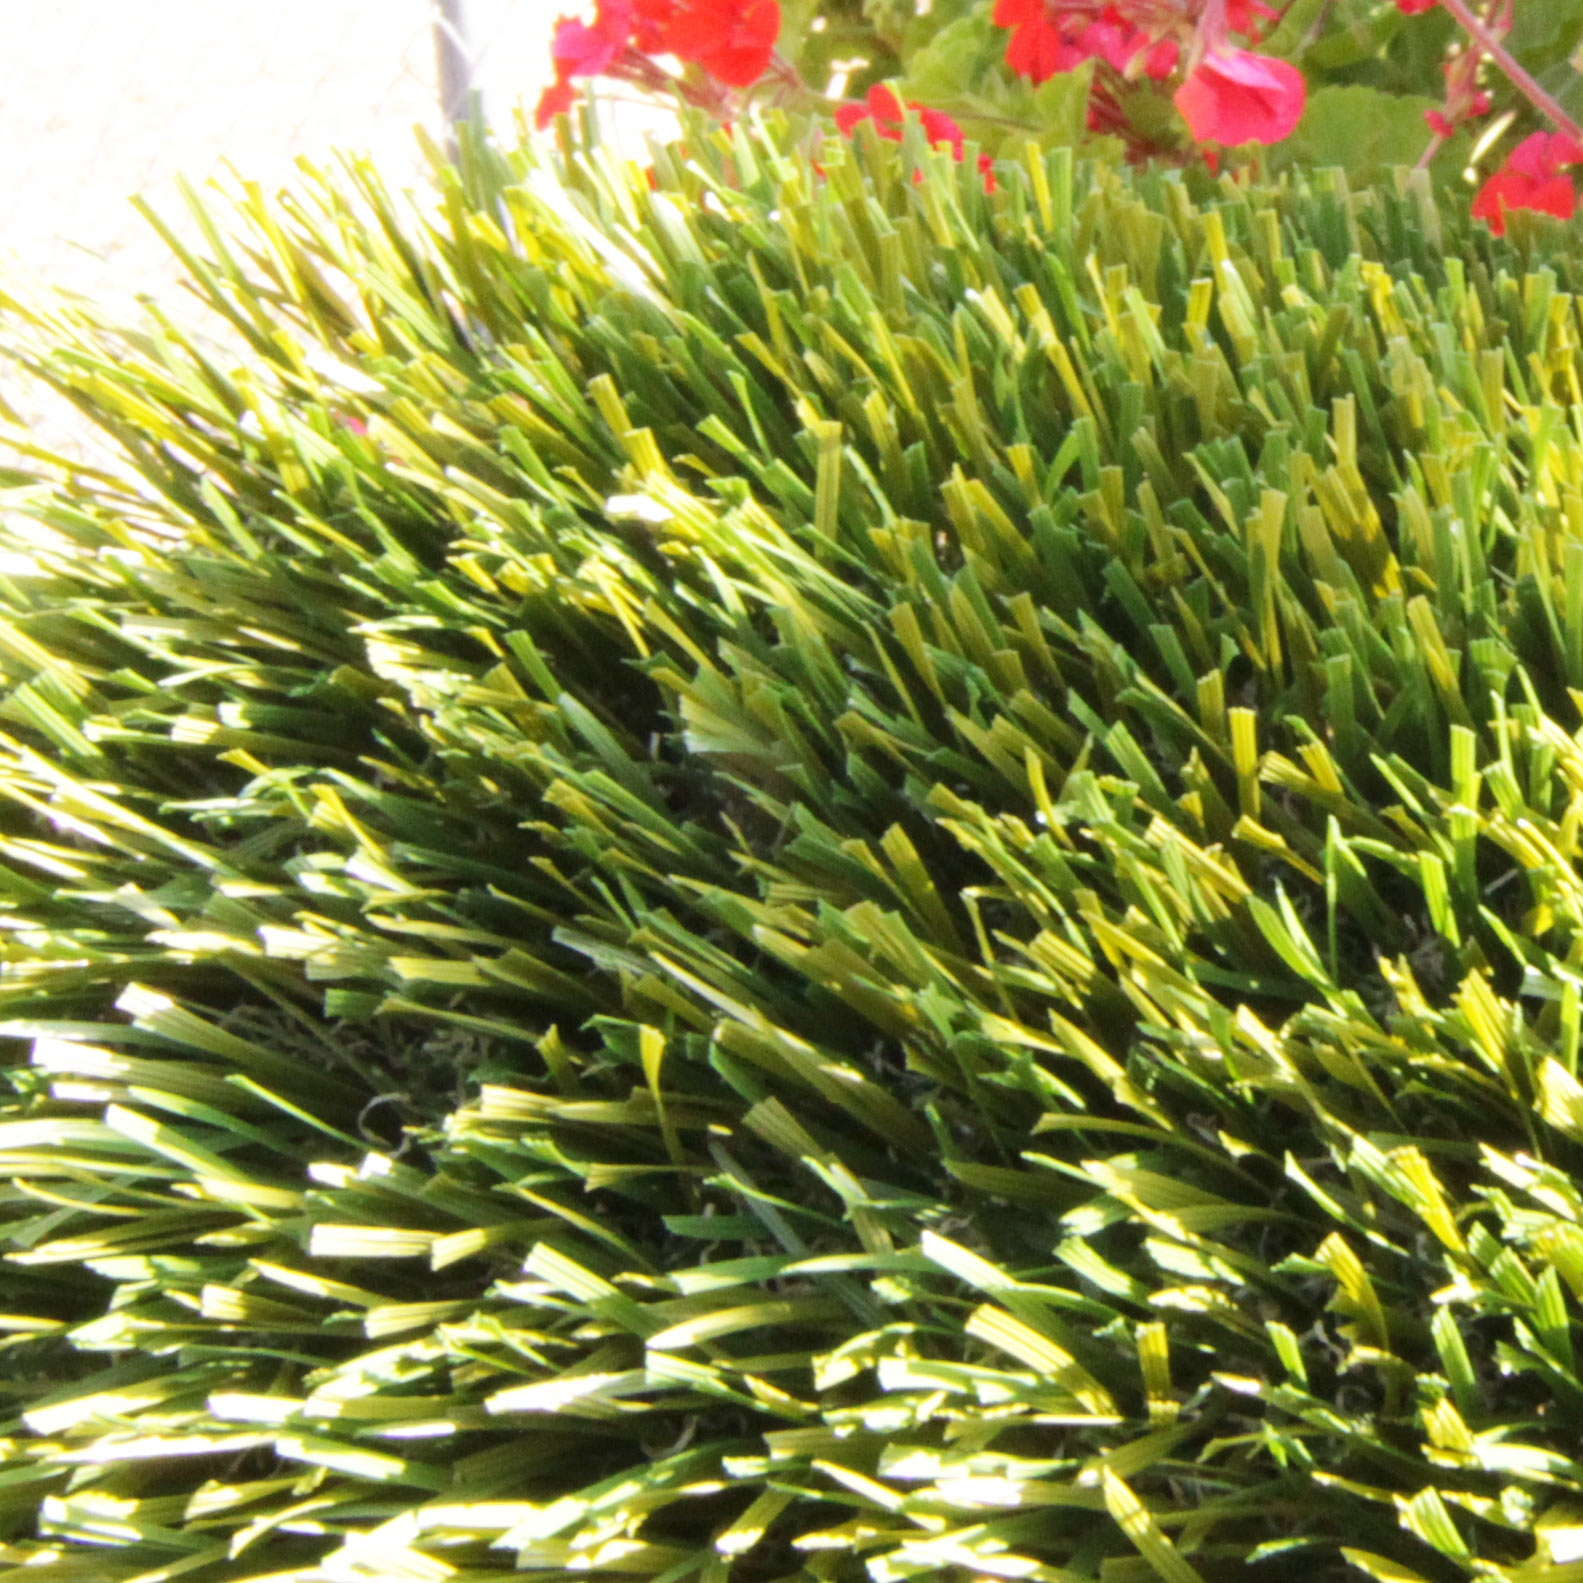 Double S Blade shape artificial grass 72 ounces